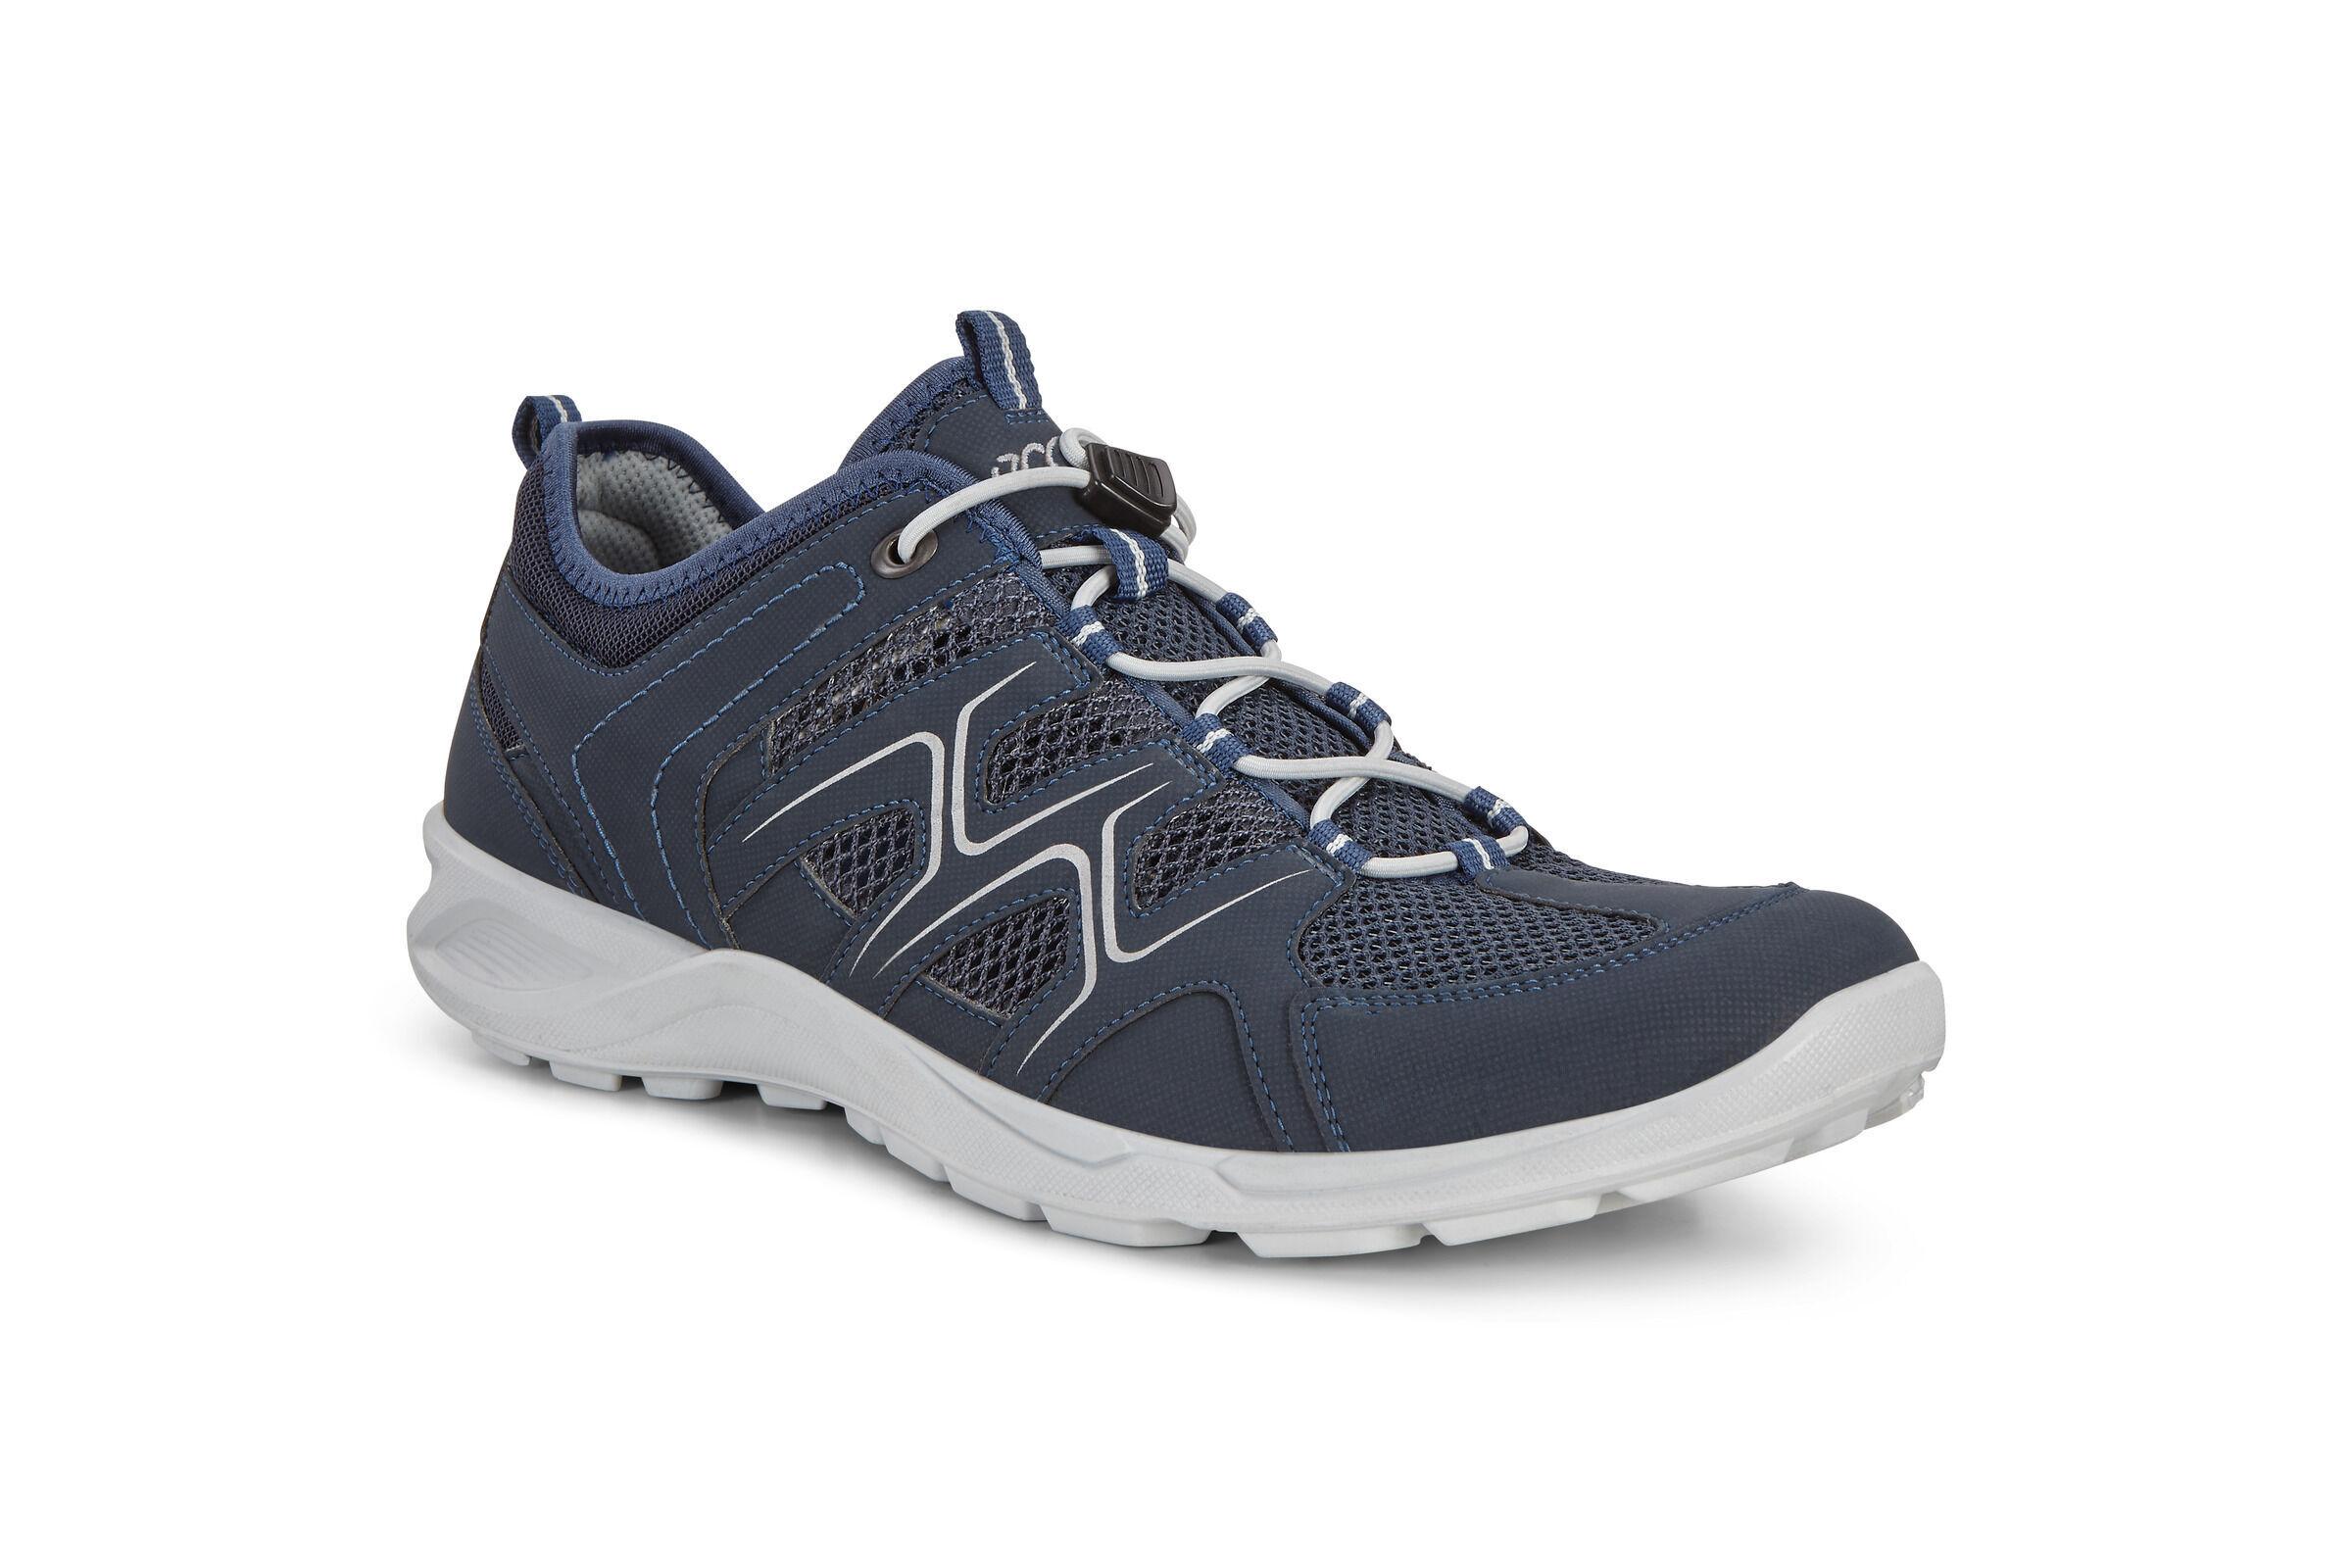 ECCO Terracruise Lt Mens Outdoor Shoes: 6 - Marine